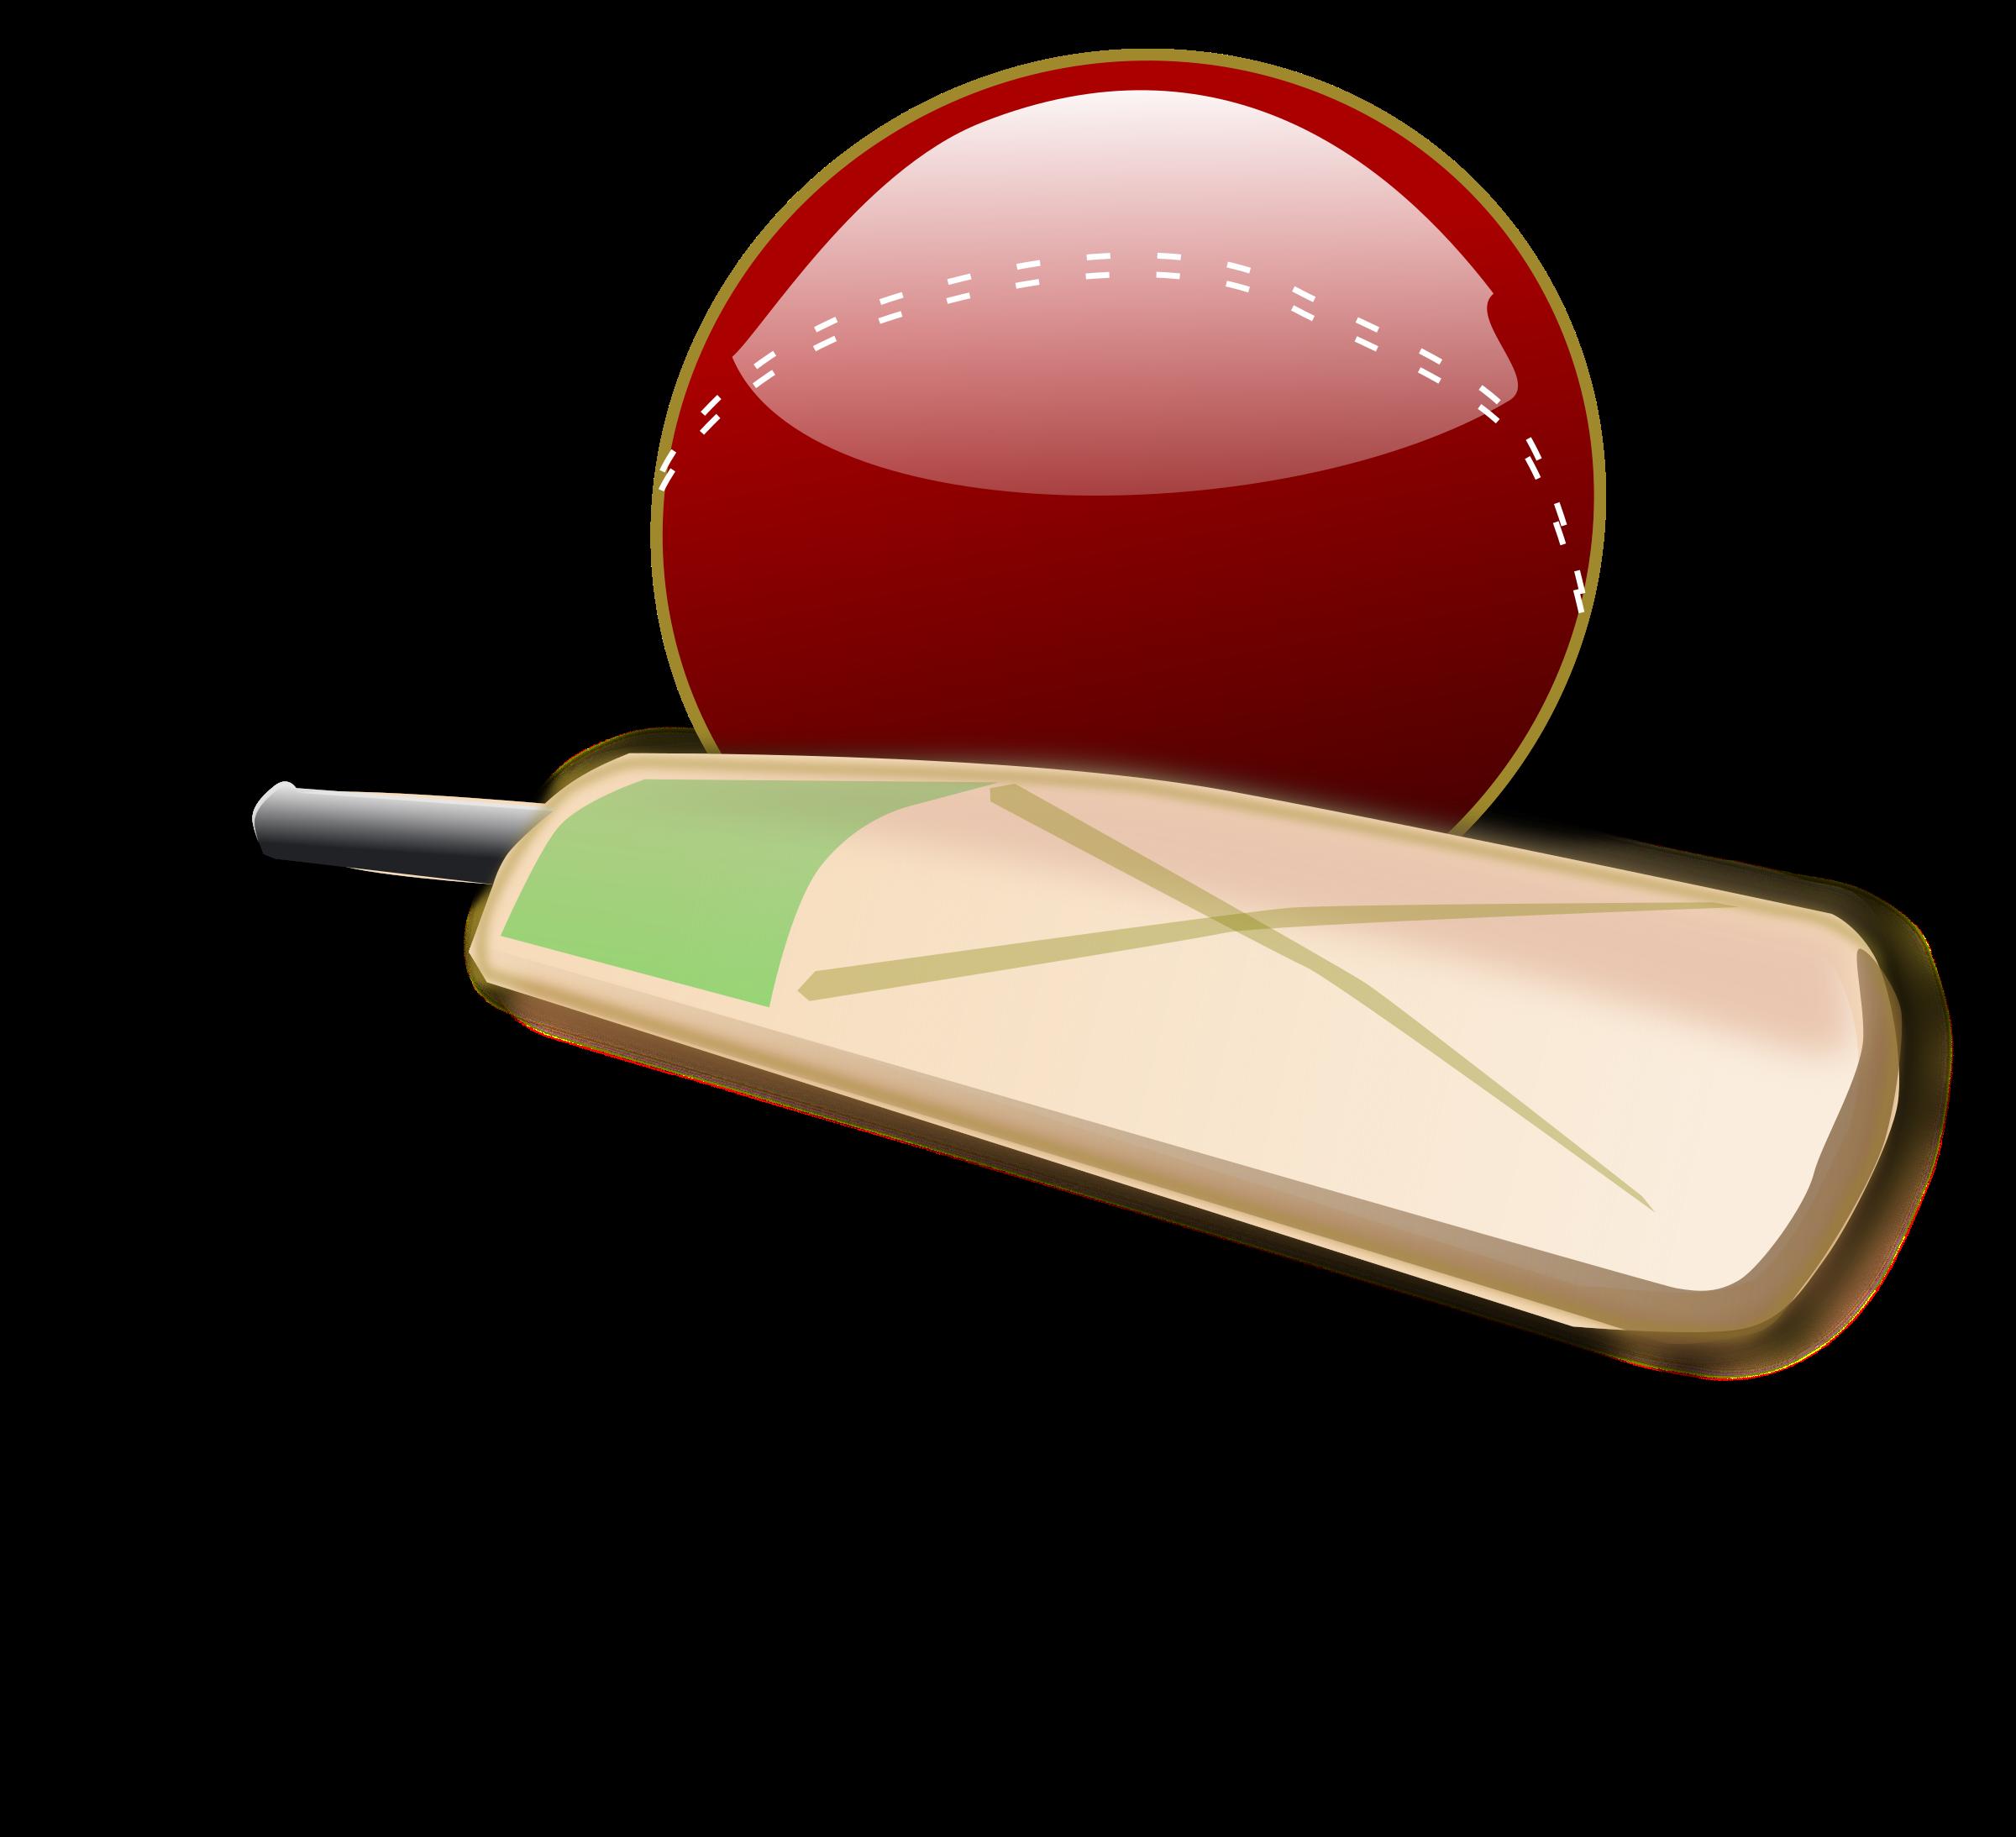 Cricket big image png. Teamwork clipart quality